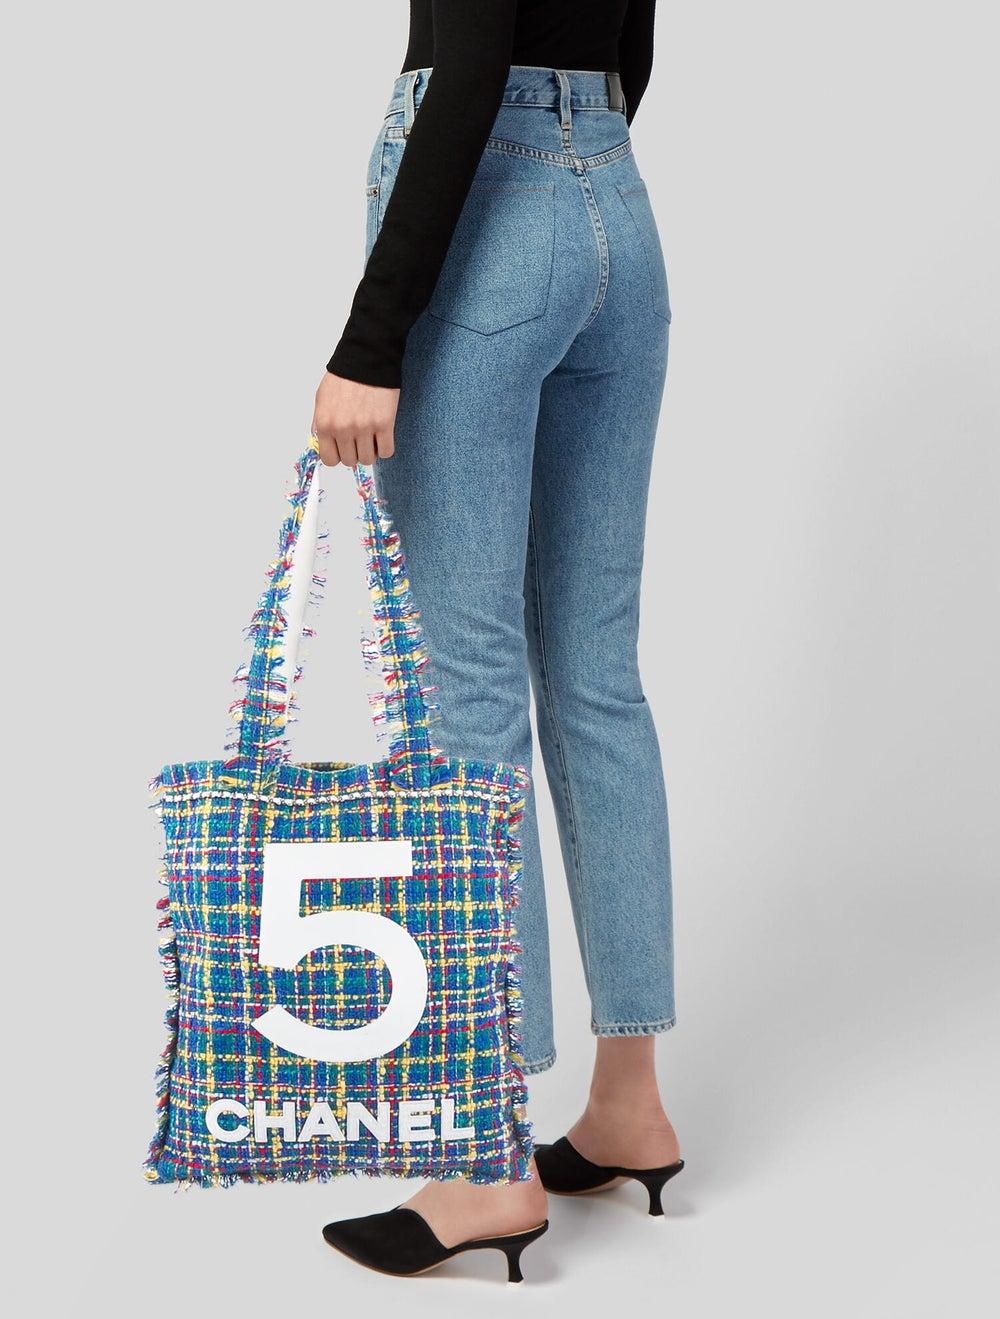 Chanel Large Tweed Shopping Bag Blue - image 2